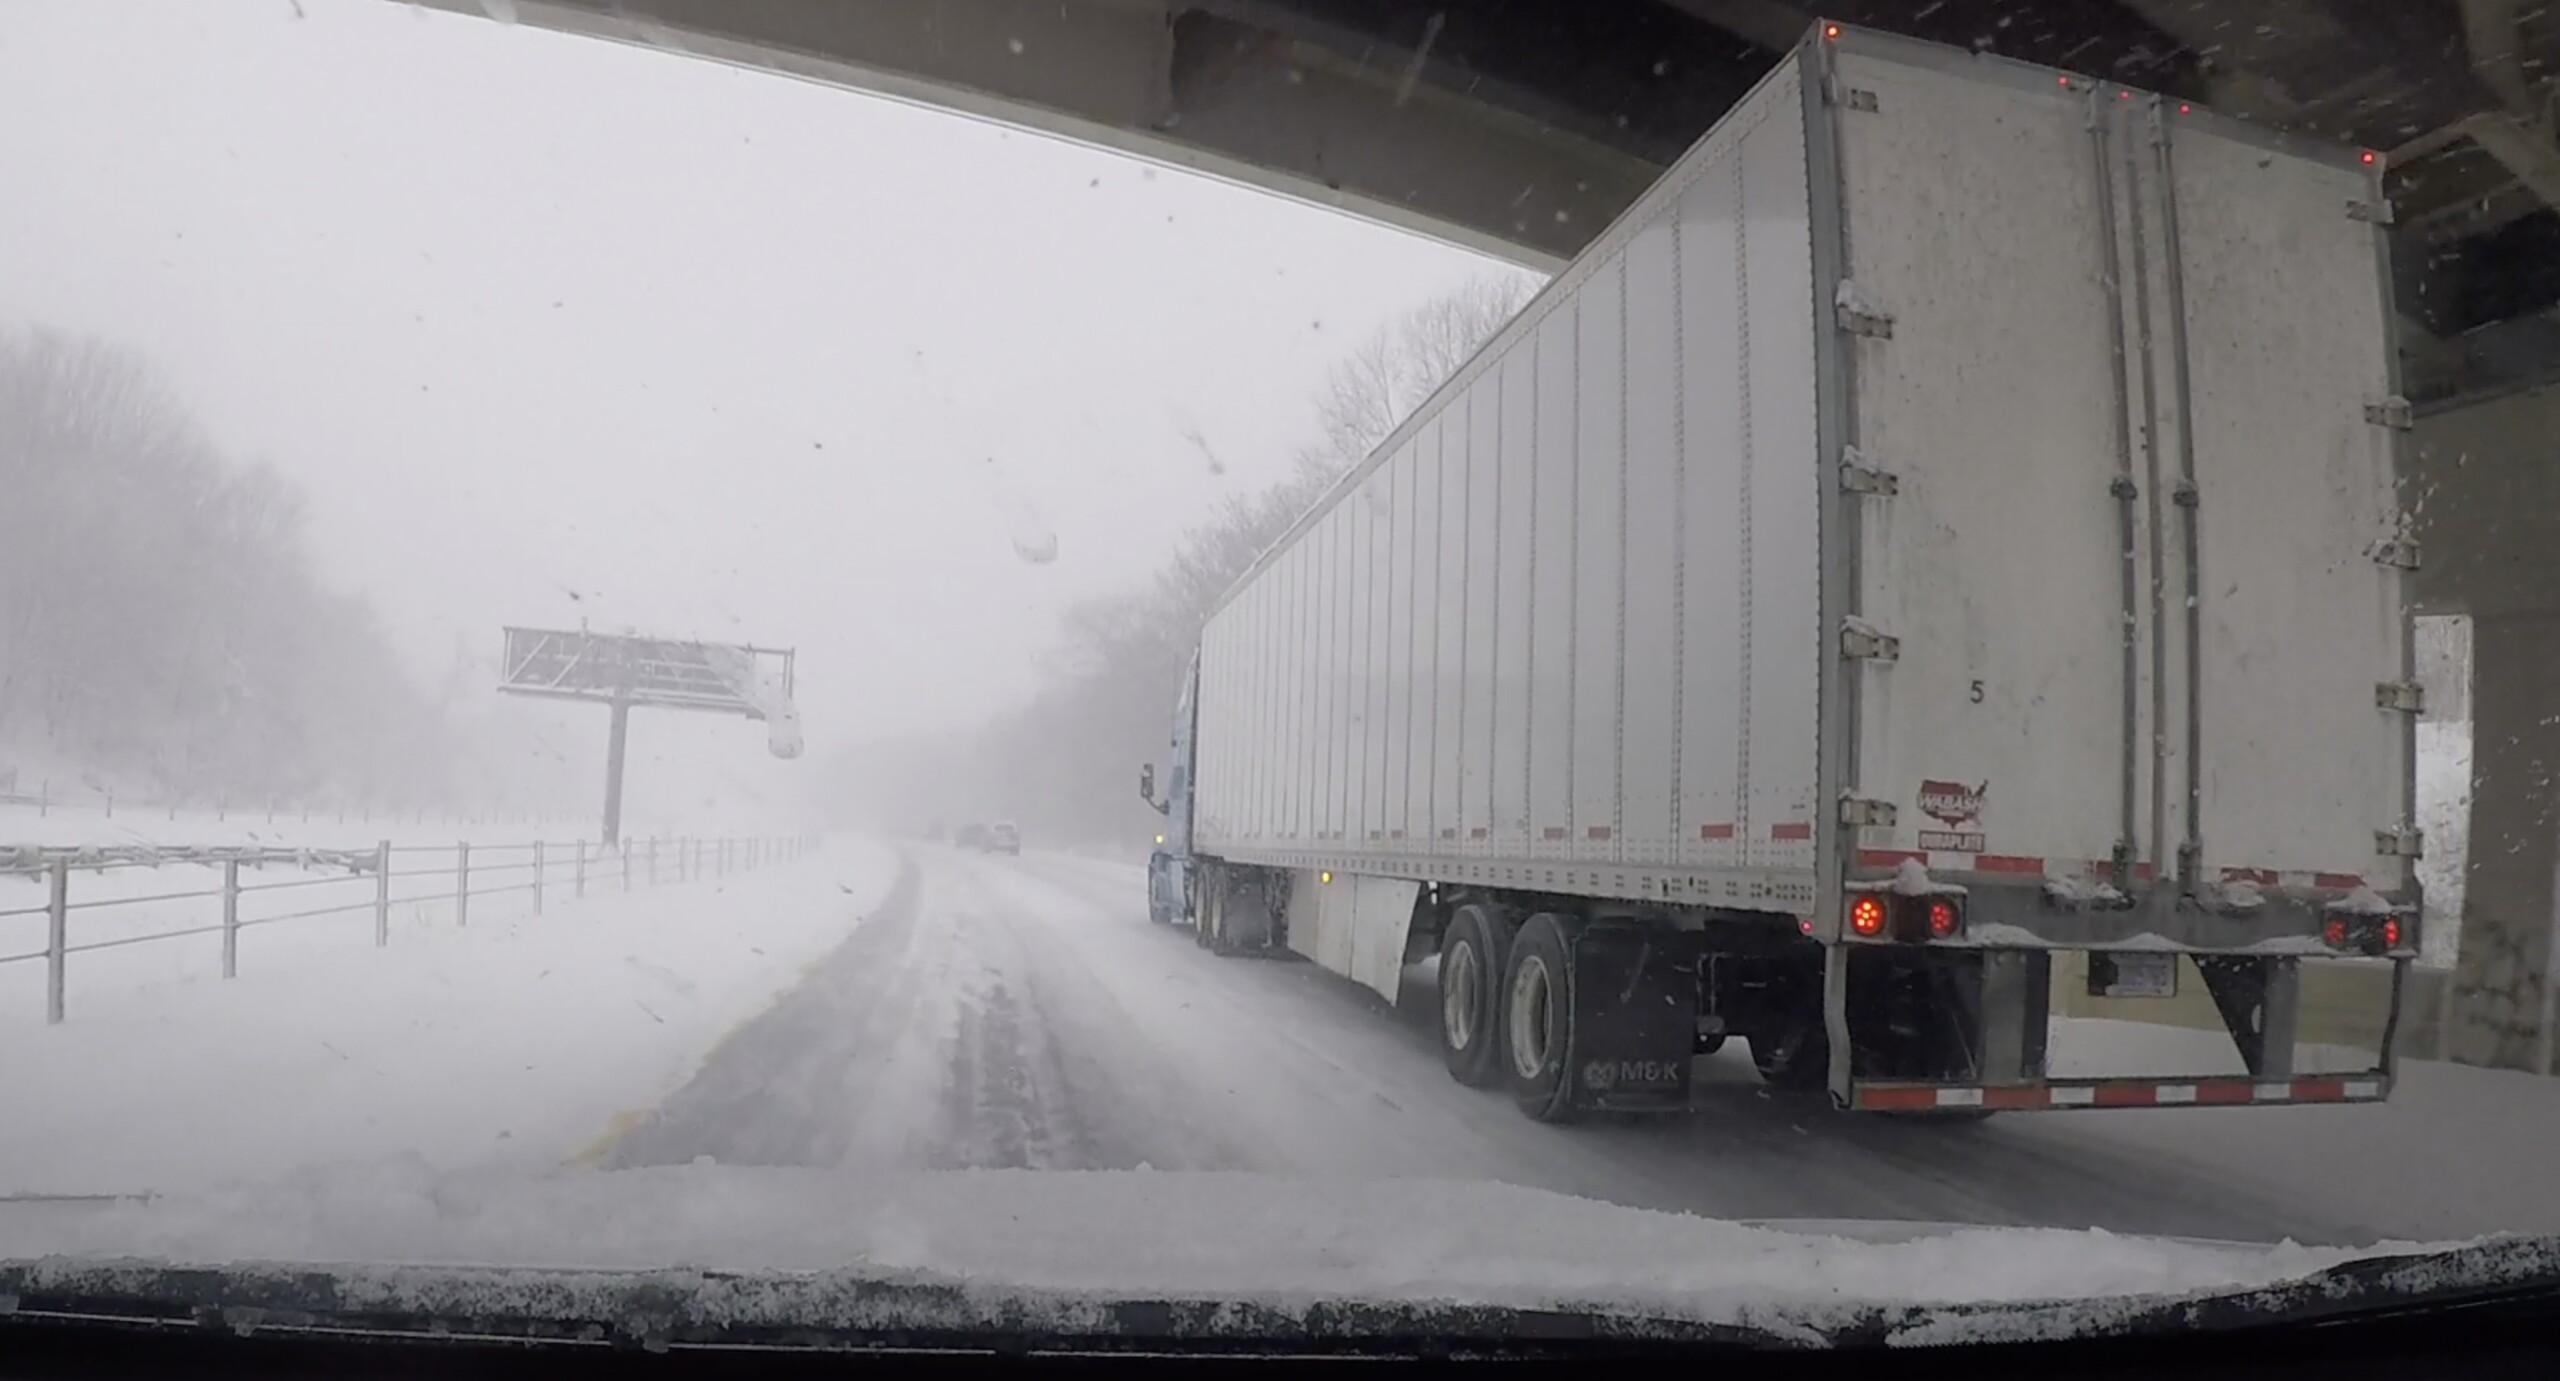 Hoghway and truck.jpg